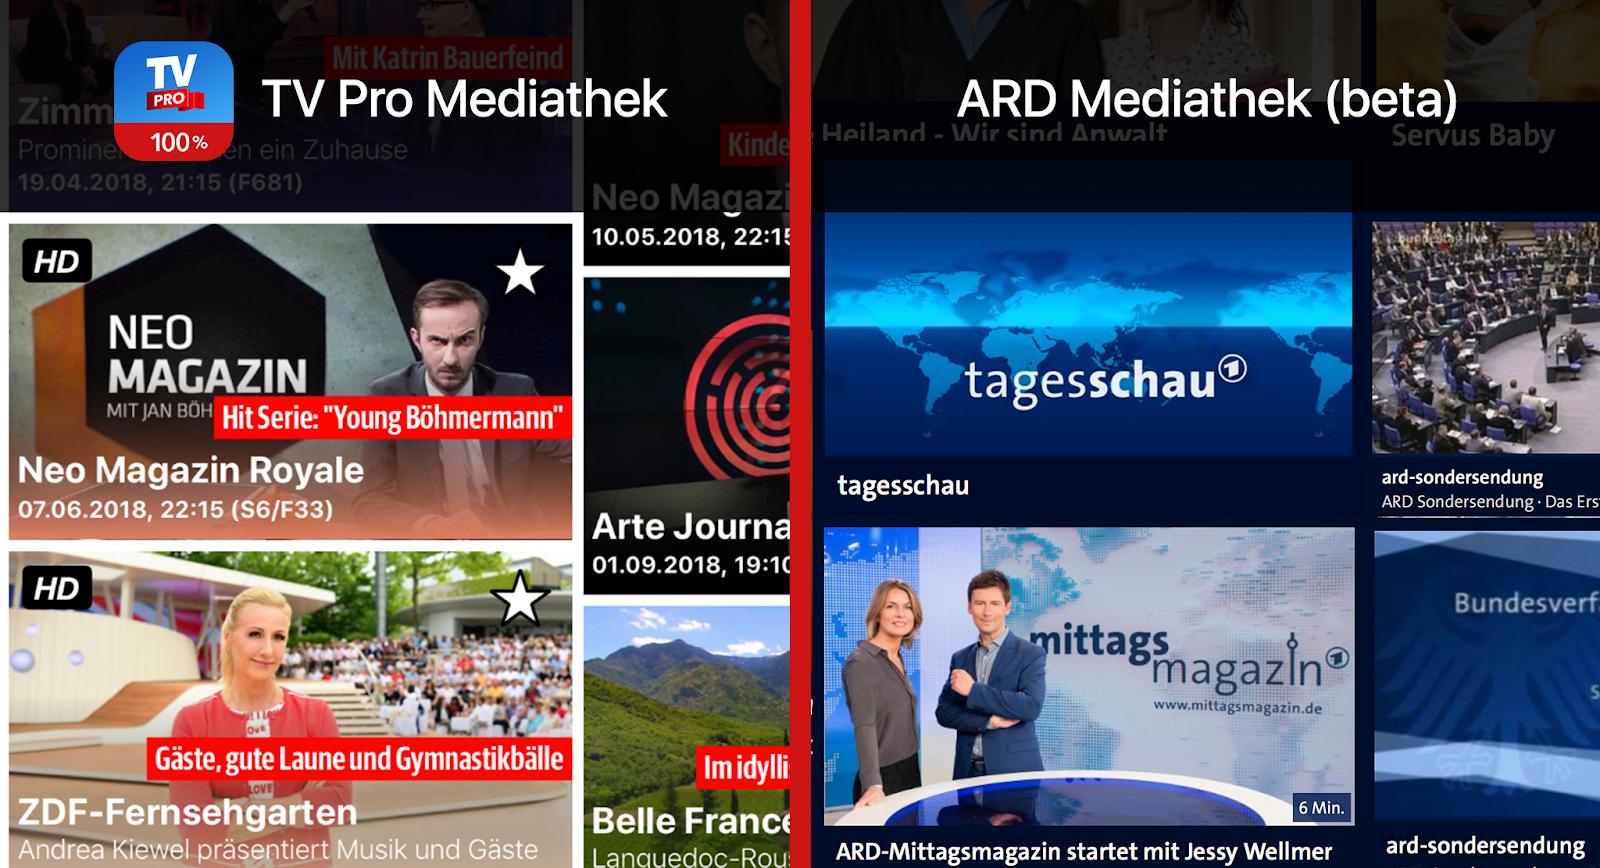 TV Pro Mediathek gegen ARD Mediathek Sender